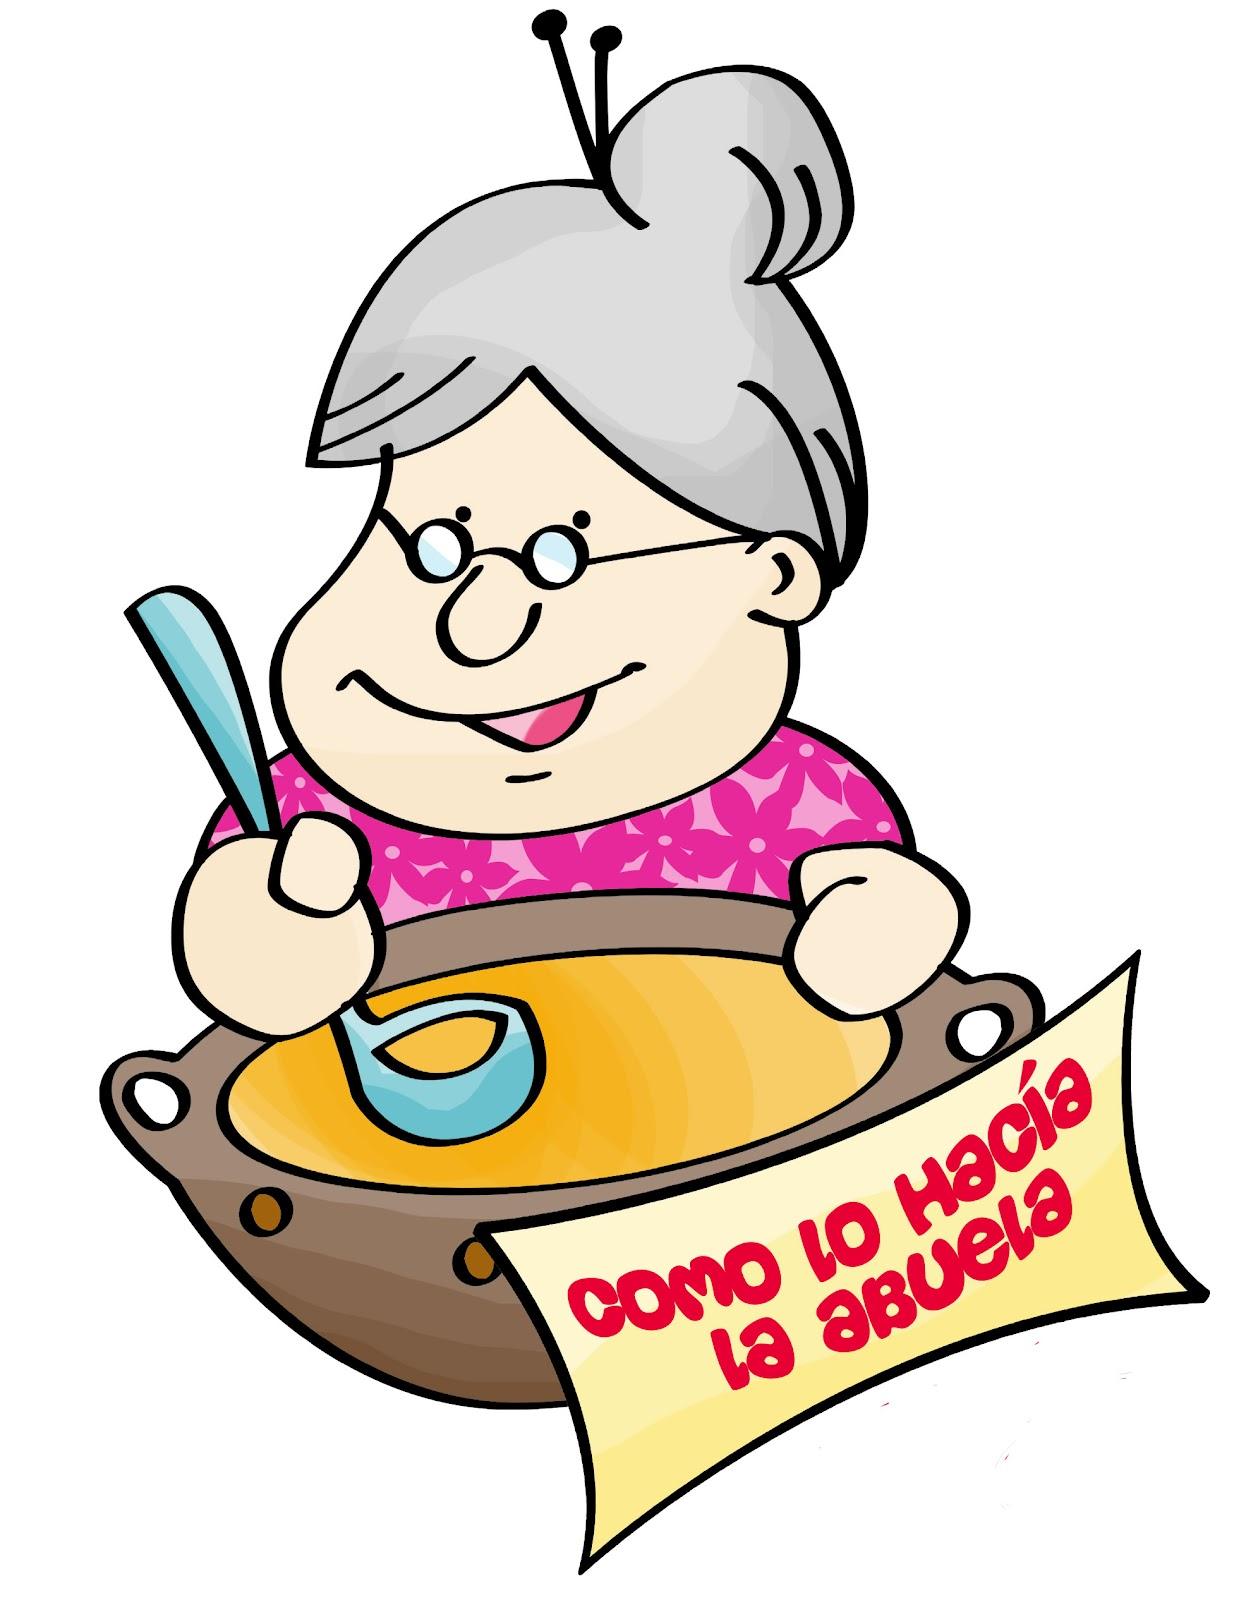 La abuela clipart image freeuse download la-abuela - AFAGA image freeuse download